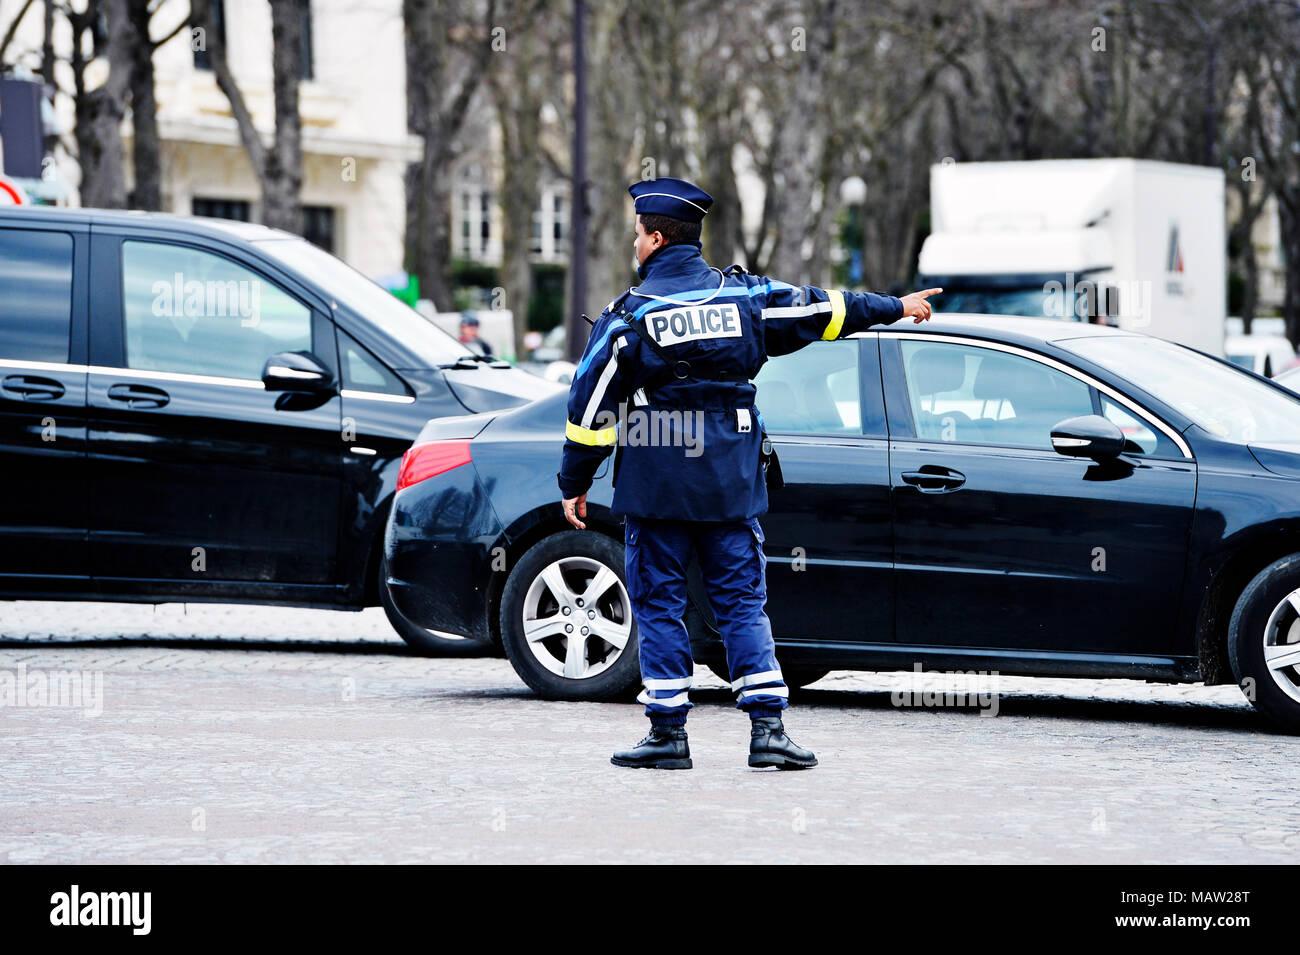 Police traffic régulation - Paris - France - Stock Image